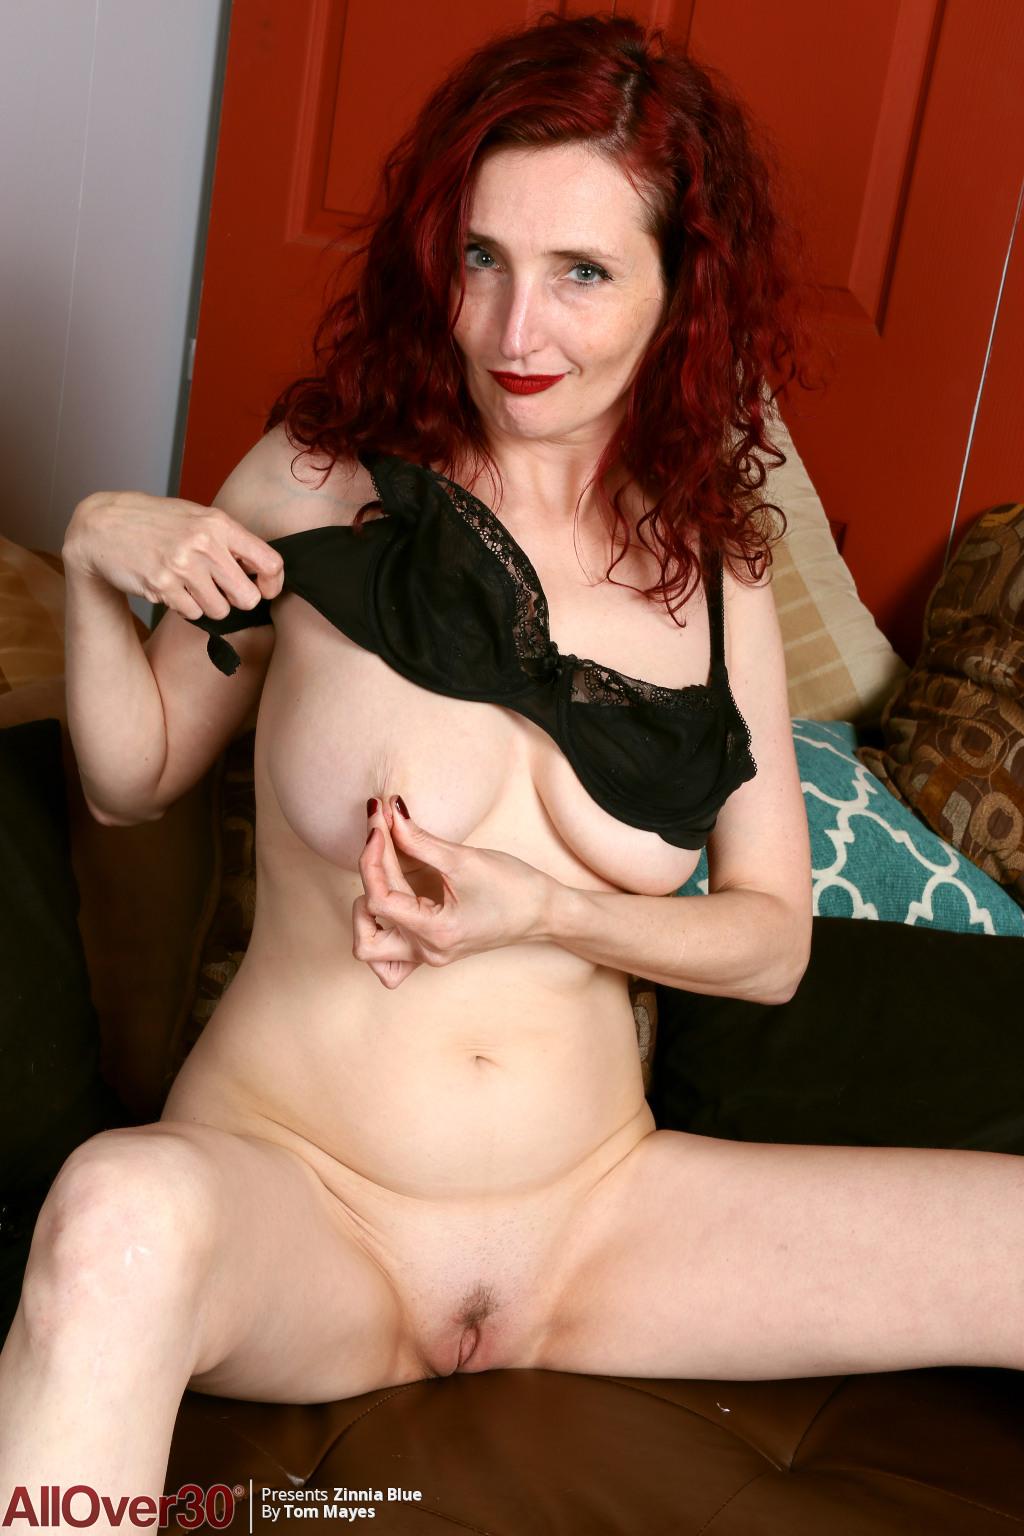 Allover30Freecom- Hot Older Women - 43 Year Old Zinnia -4199